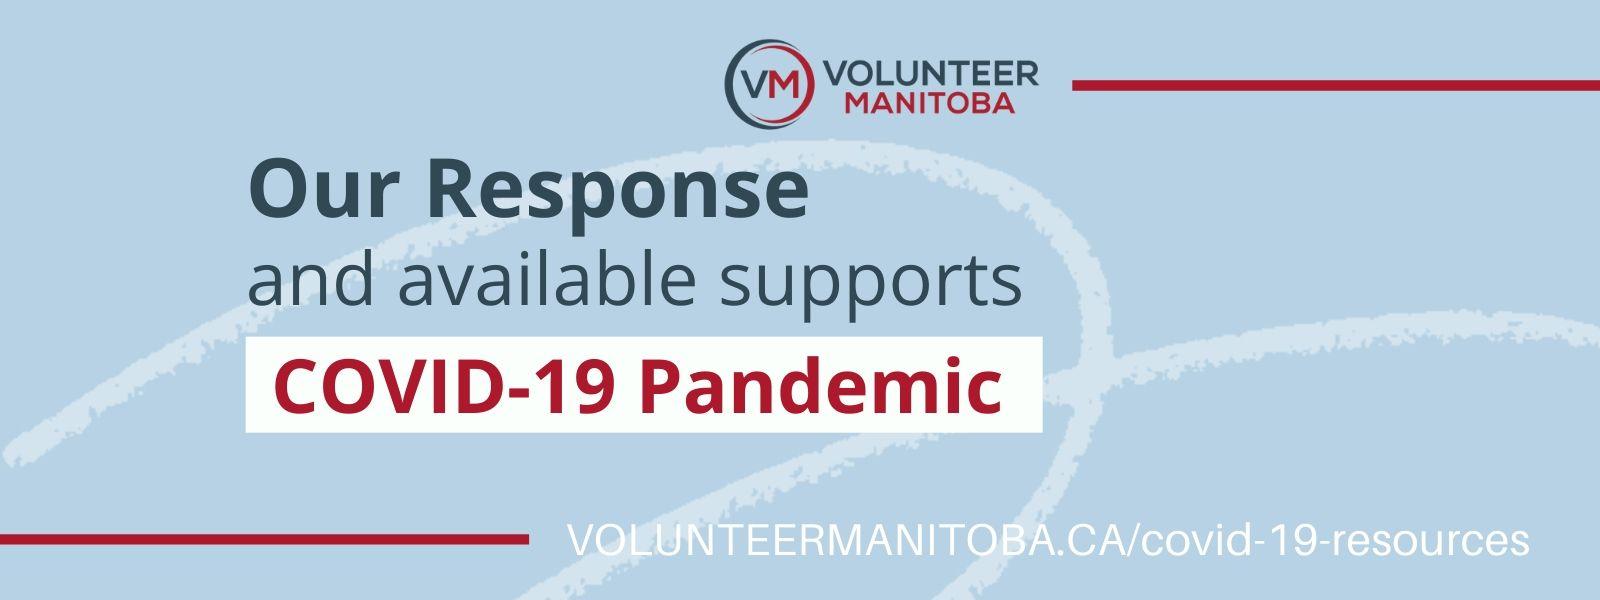 Volunteer Manitoba's Response to COVID-19